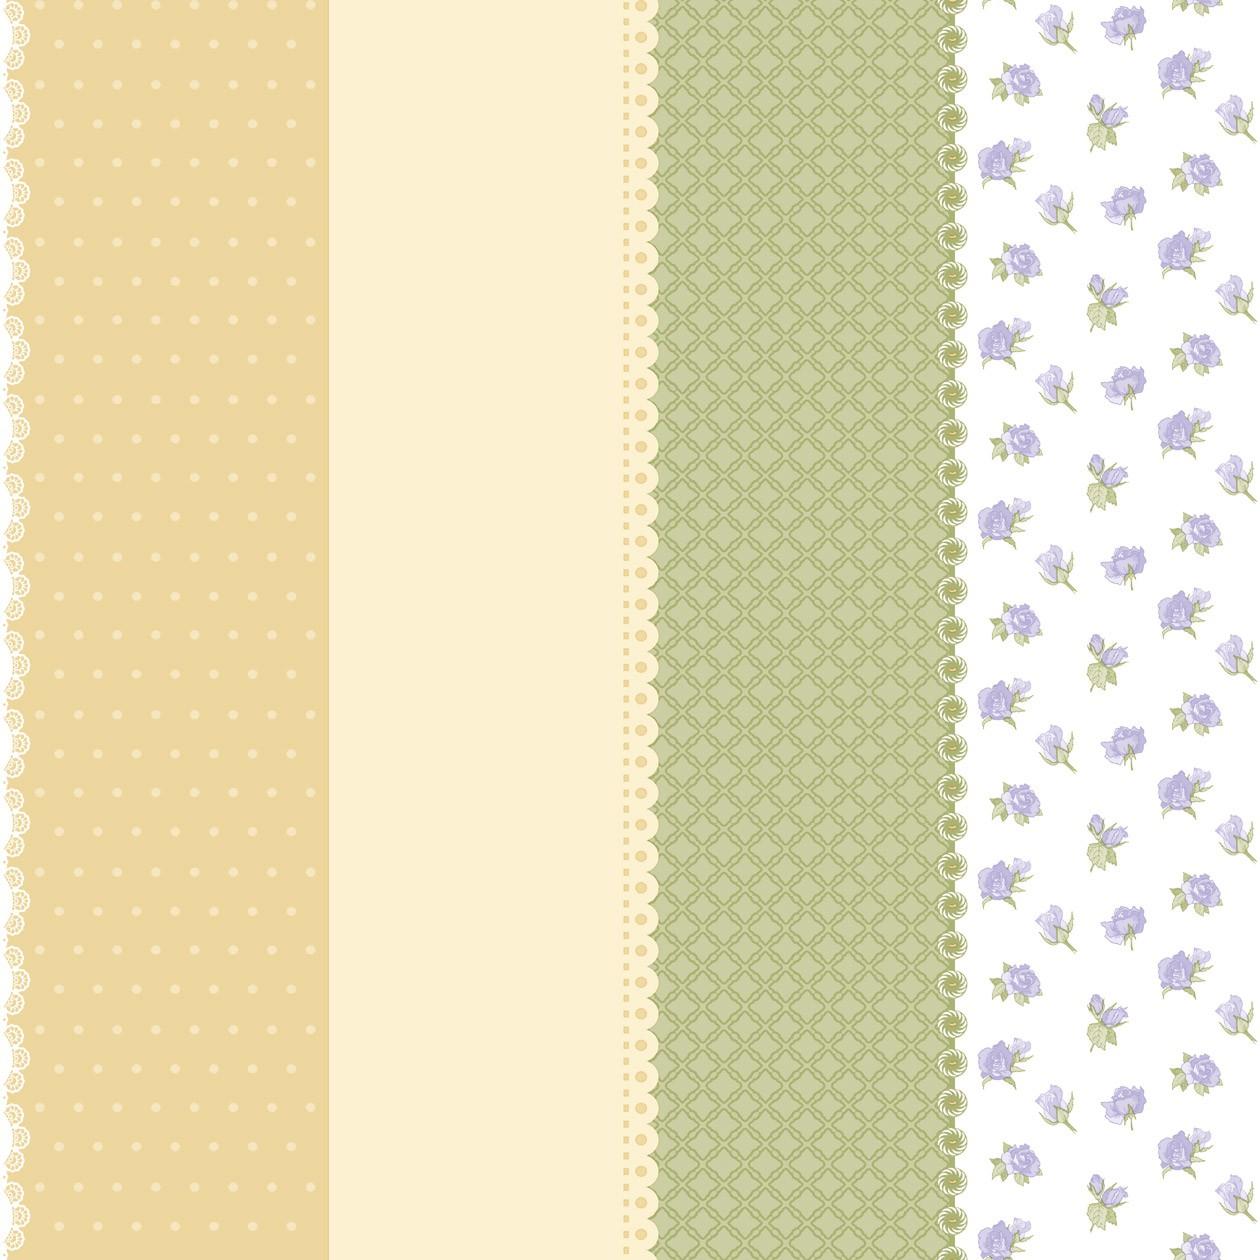 Vliestapete Punkte Kariert Blumen gelb beige grün Bim Bum Bam 002227